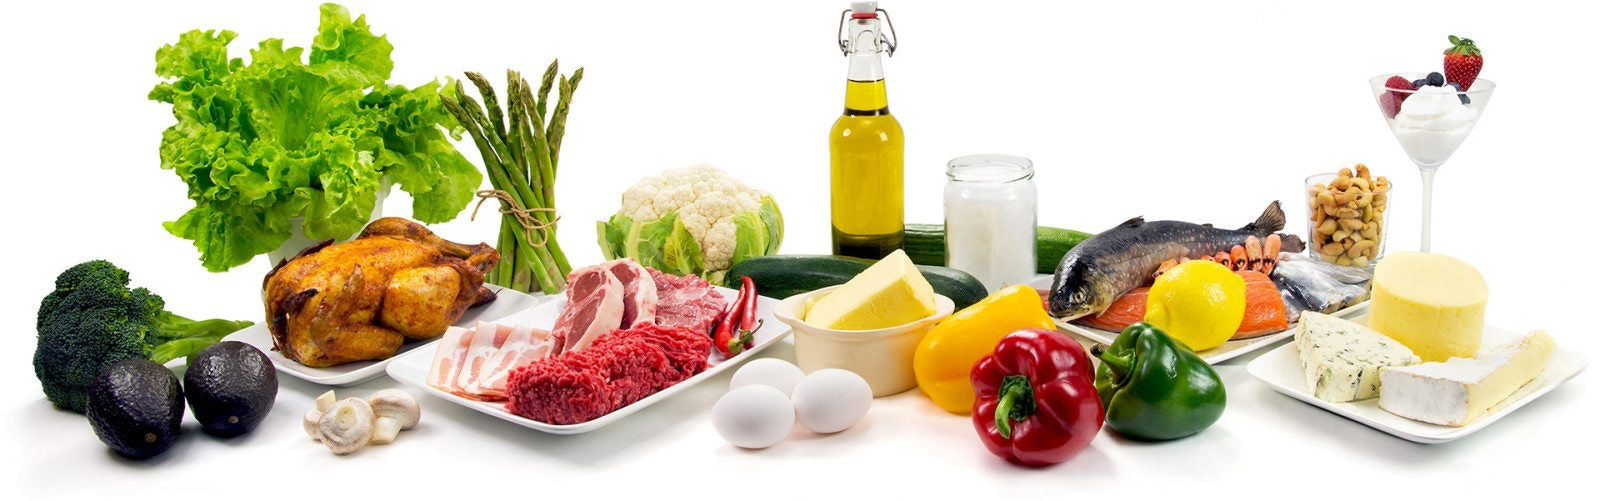 diet doctor lchf